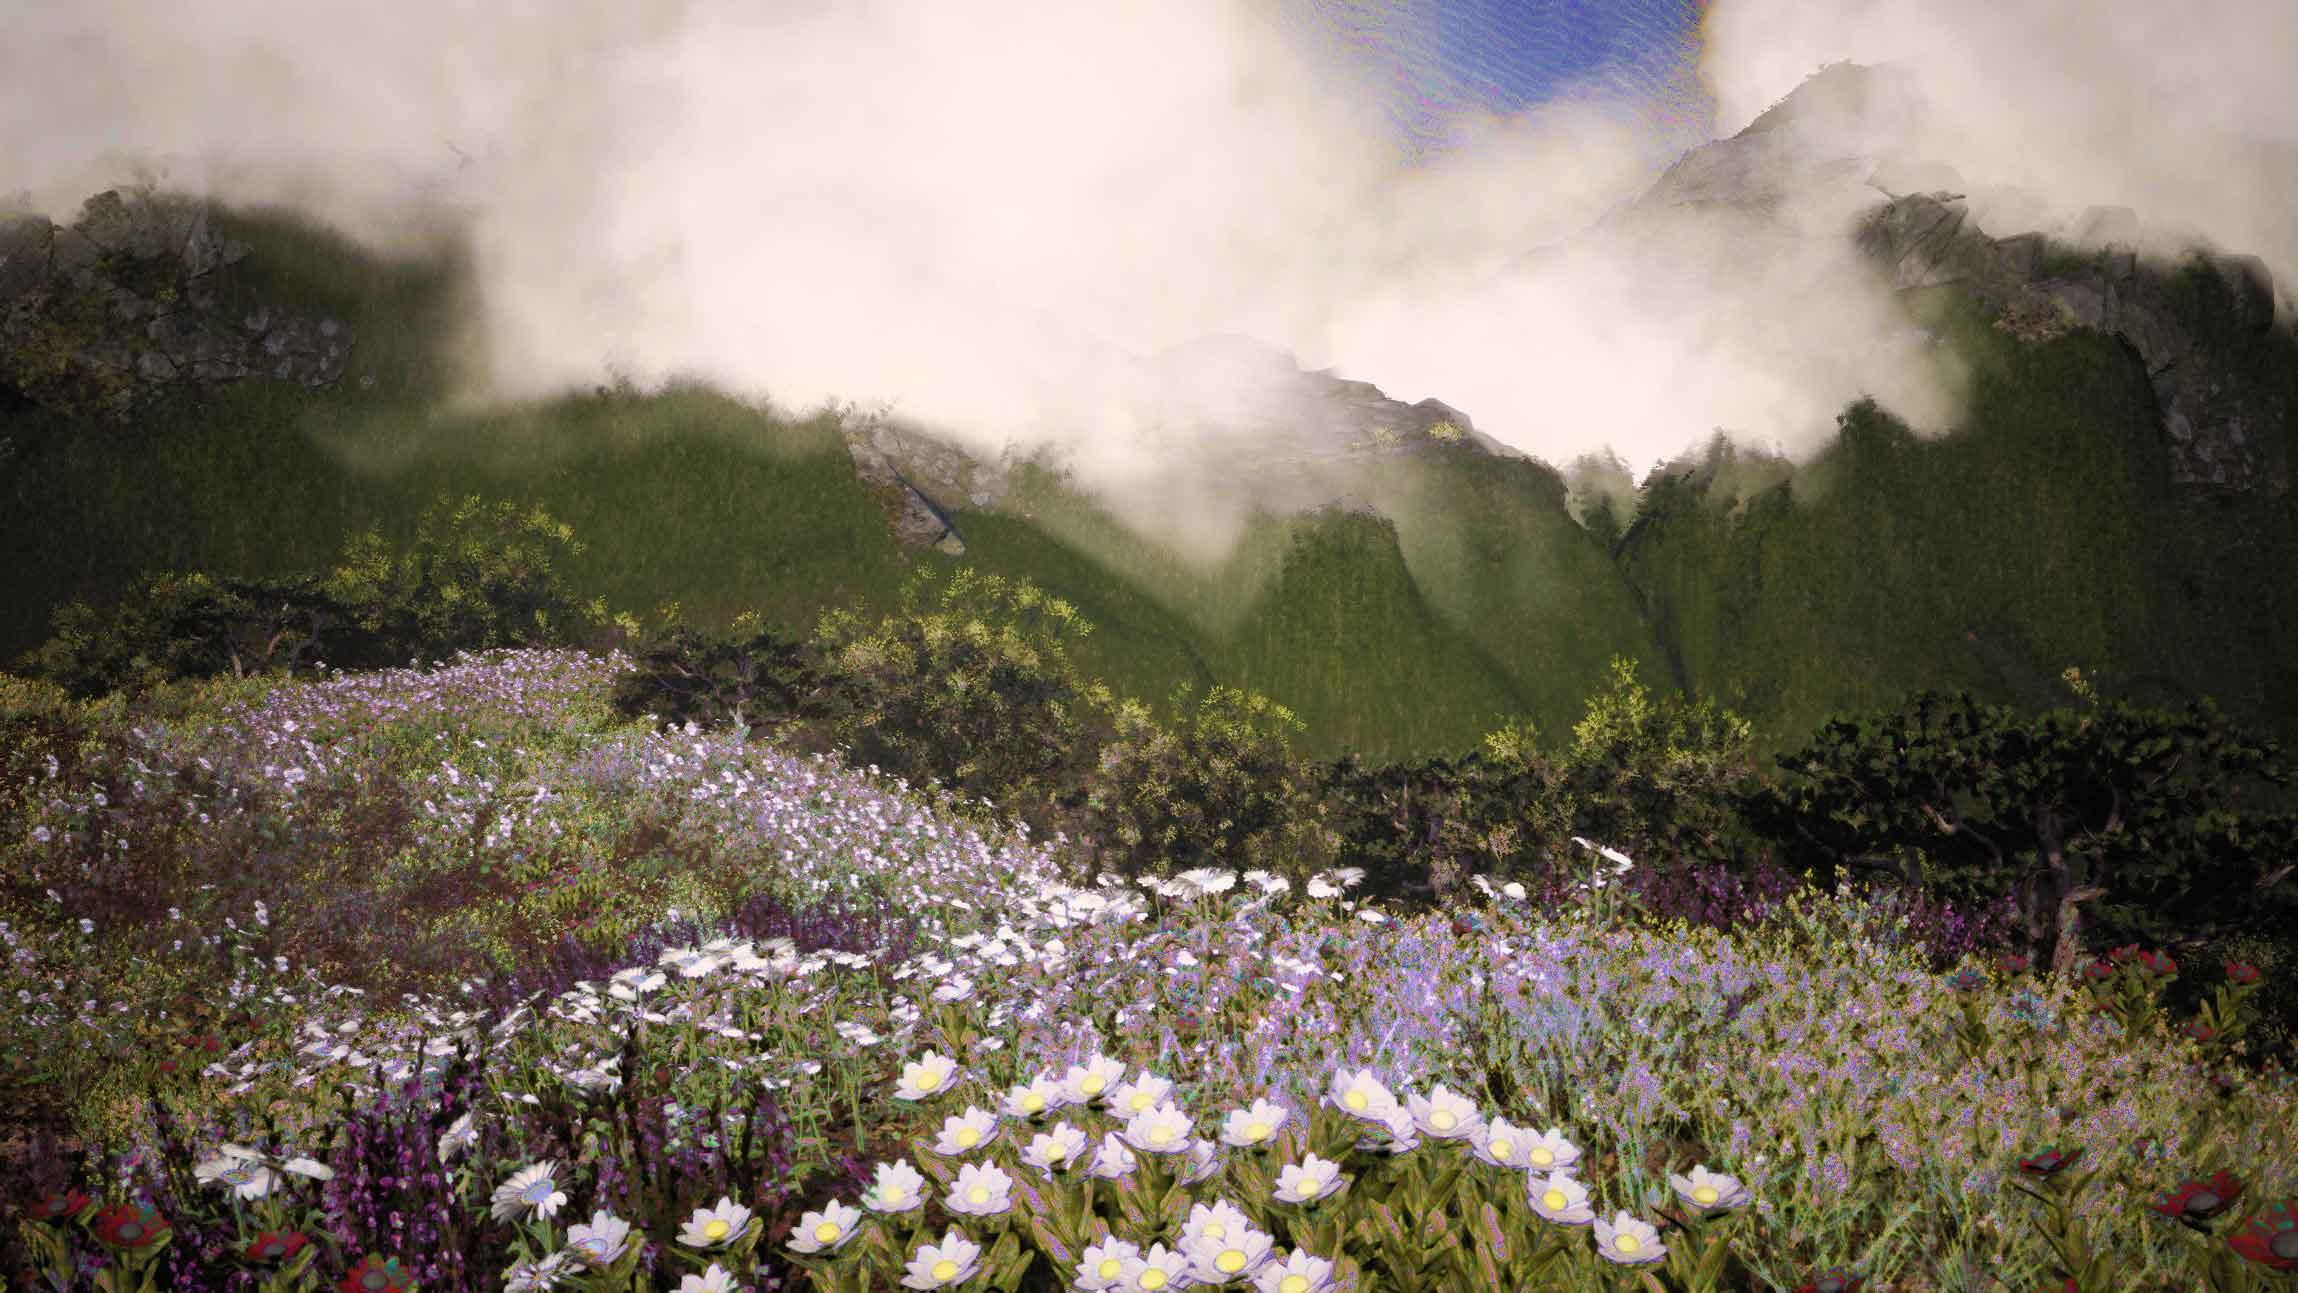 Resurecting The Sublime_Leucadendron_Landscape